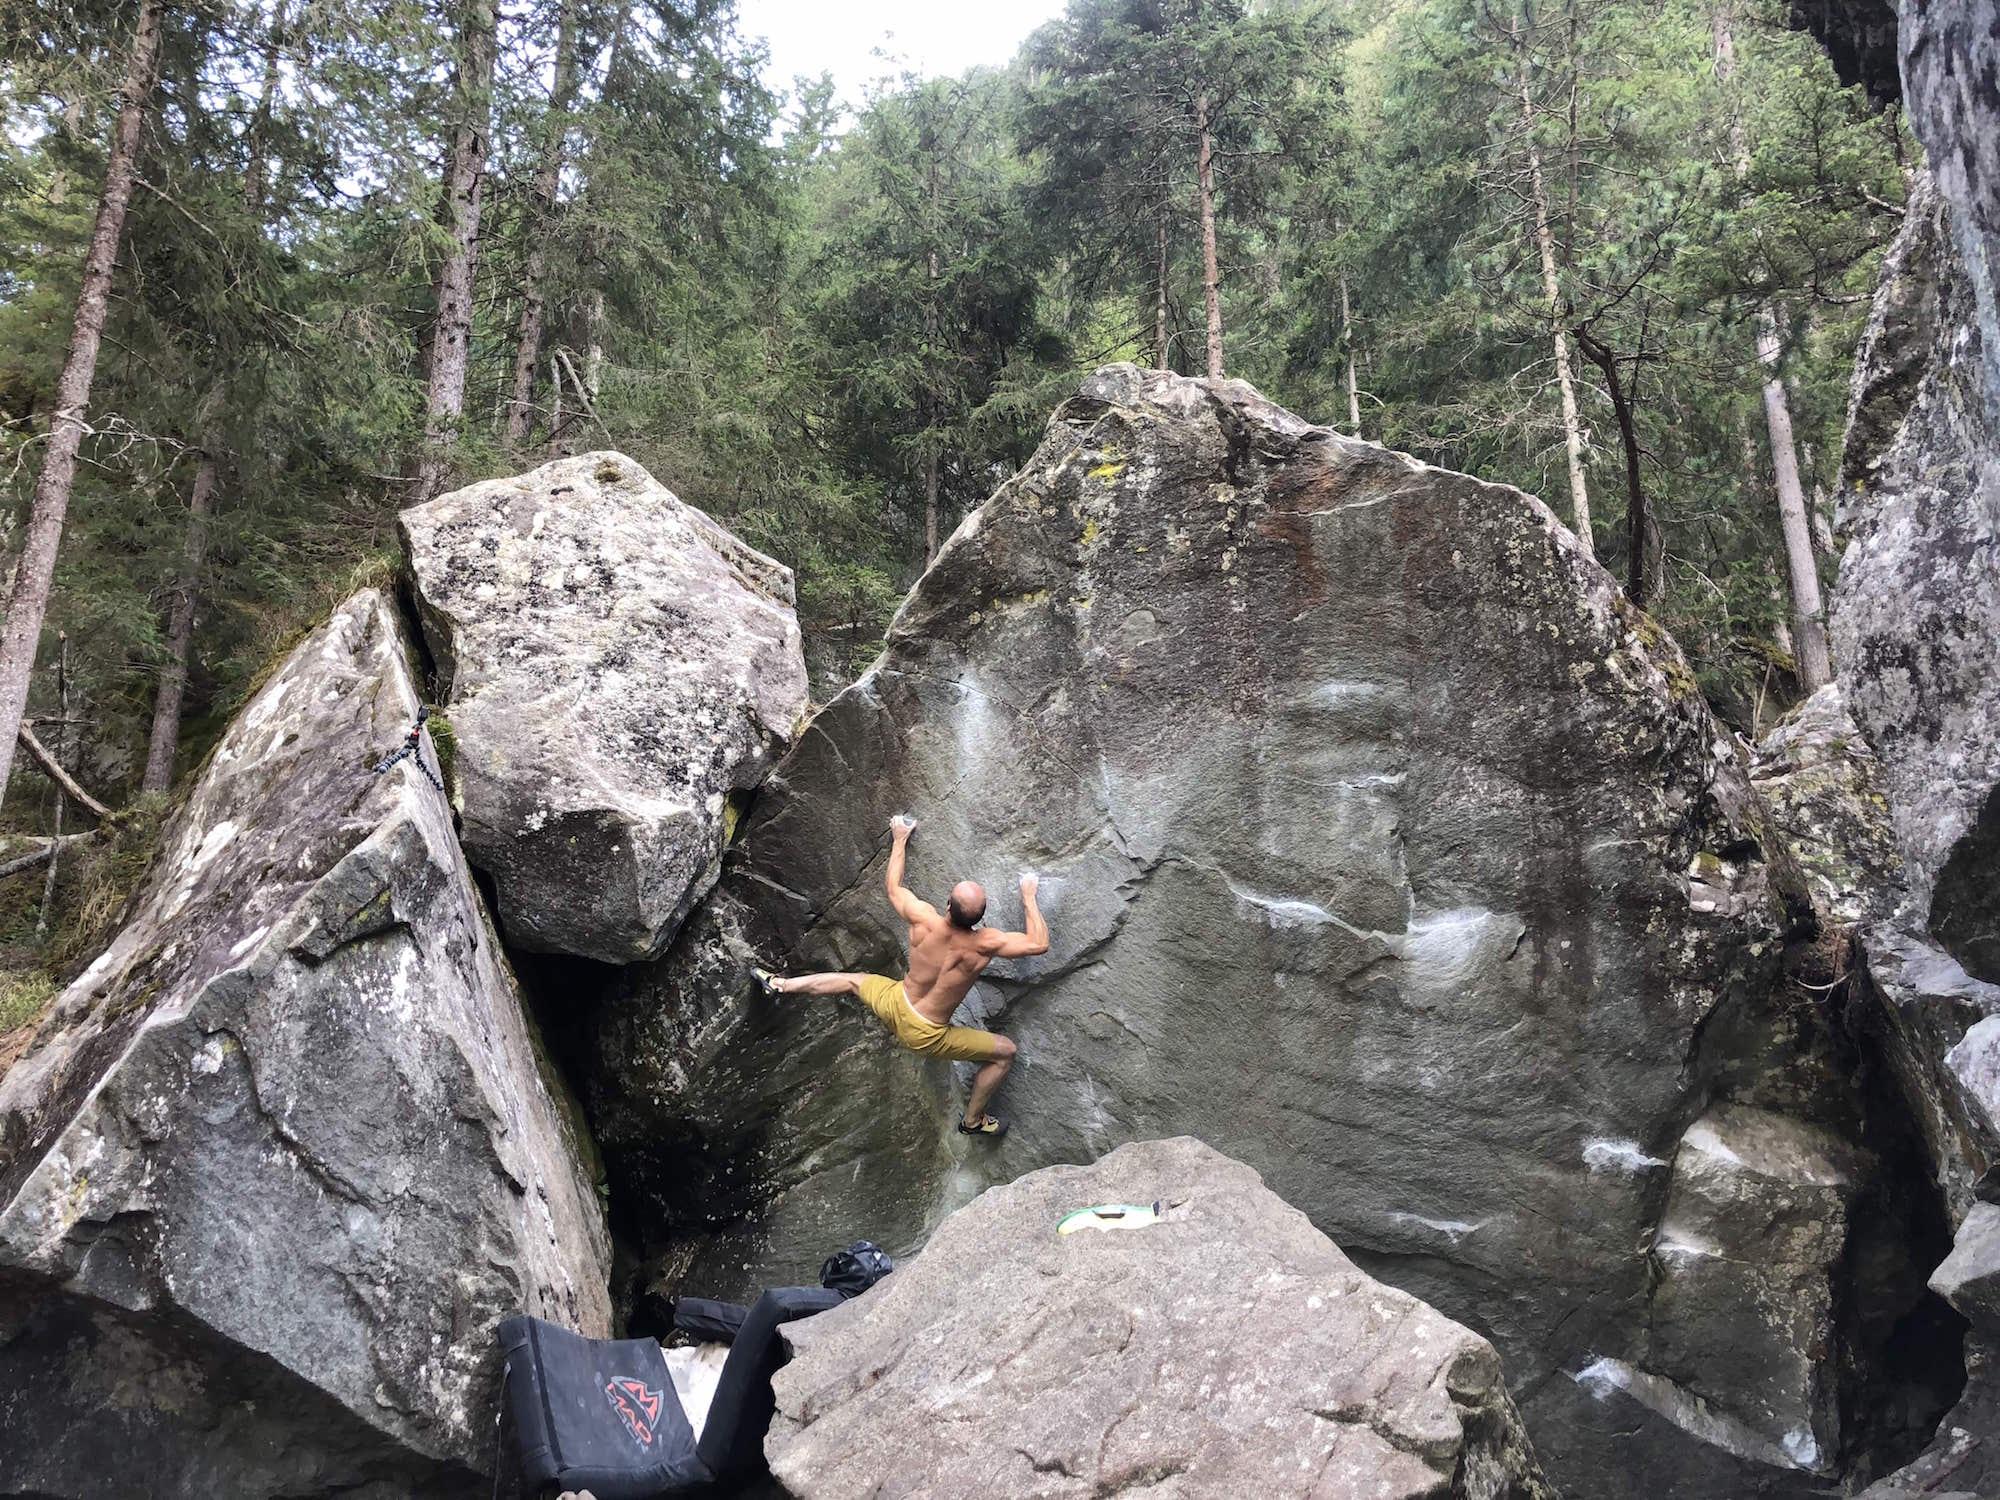 FrictionLabs Athlete Carlos Higuera climbing a tall boulder